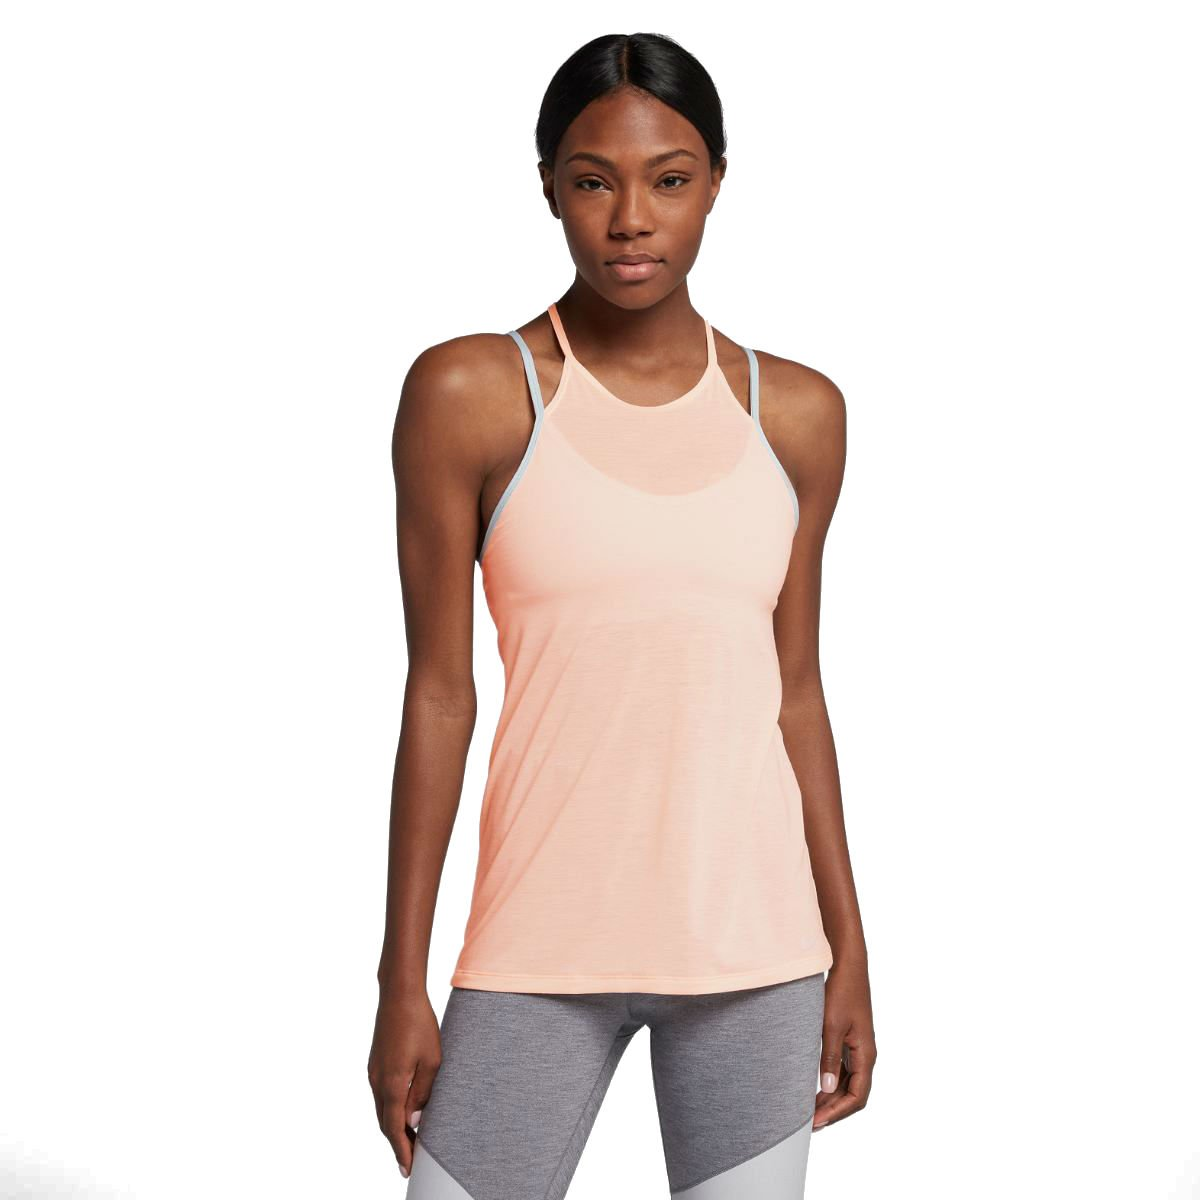 Nike Damen Dry Tank Sport Sps18 Damens Tops